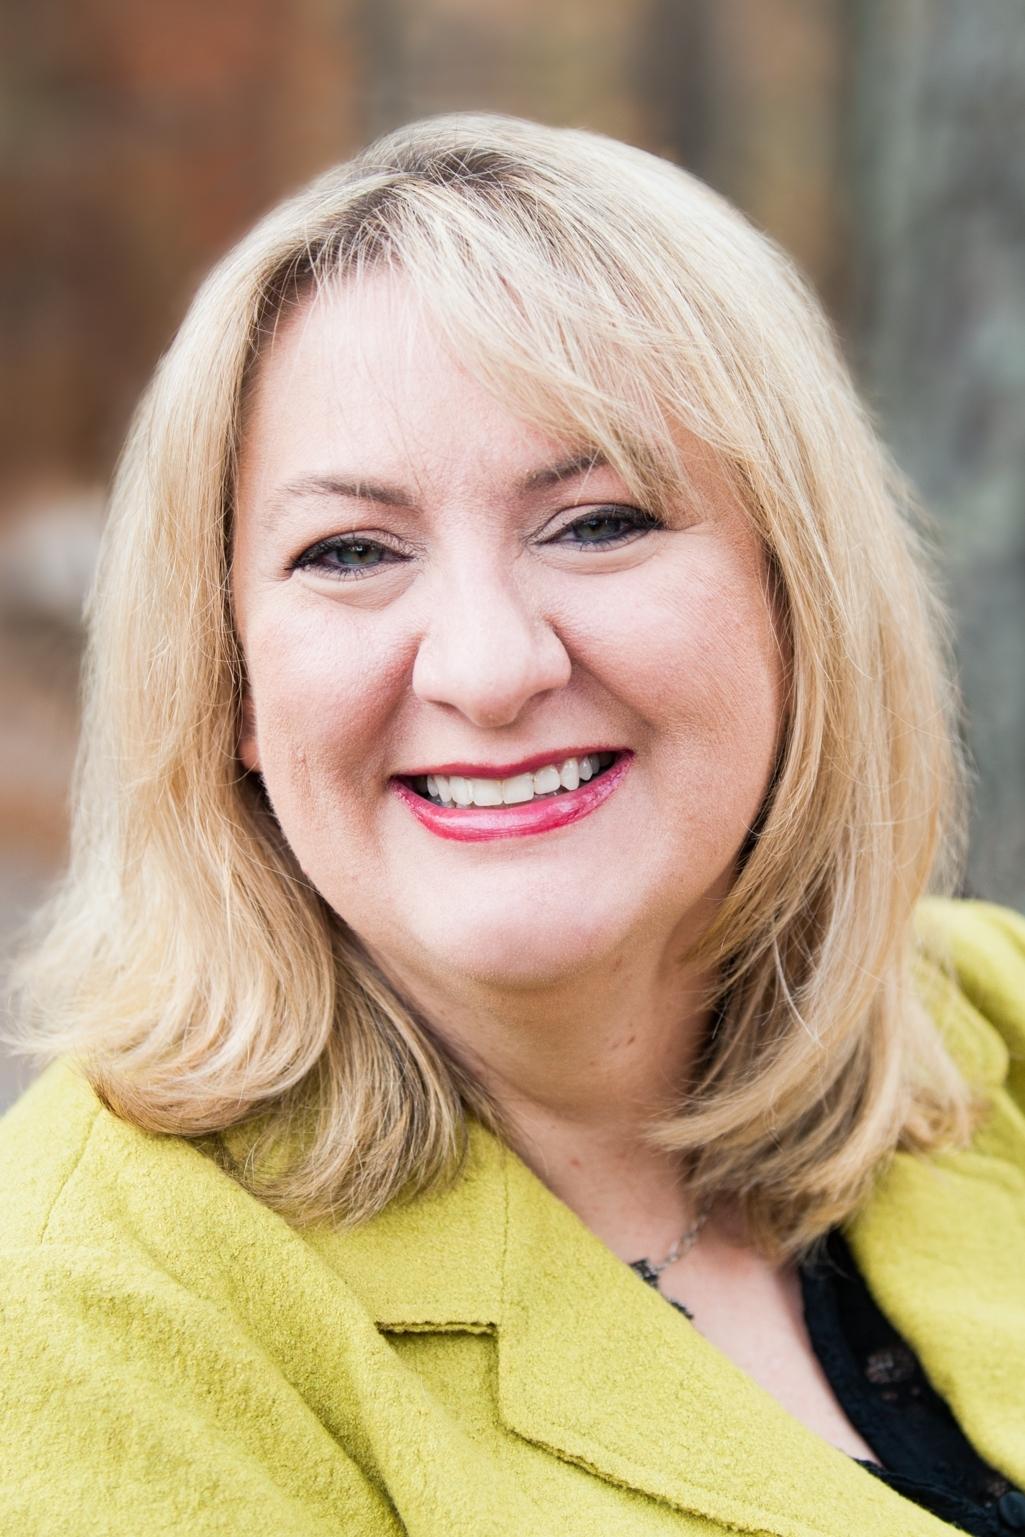 sylvie lansdowne - Wedding Coordinator and Administrative Assistant